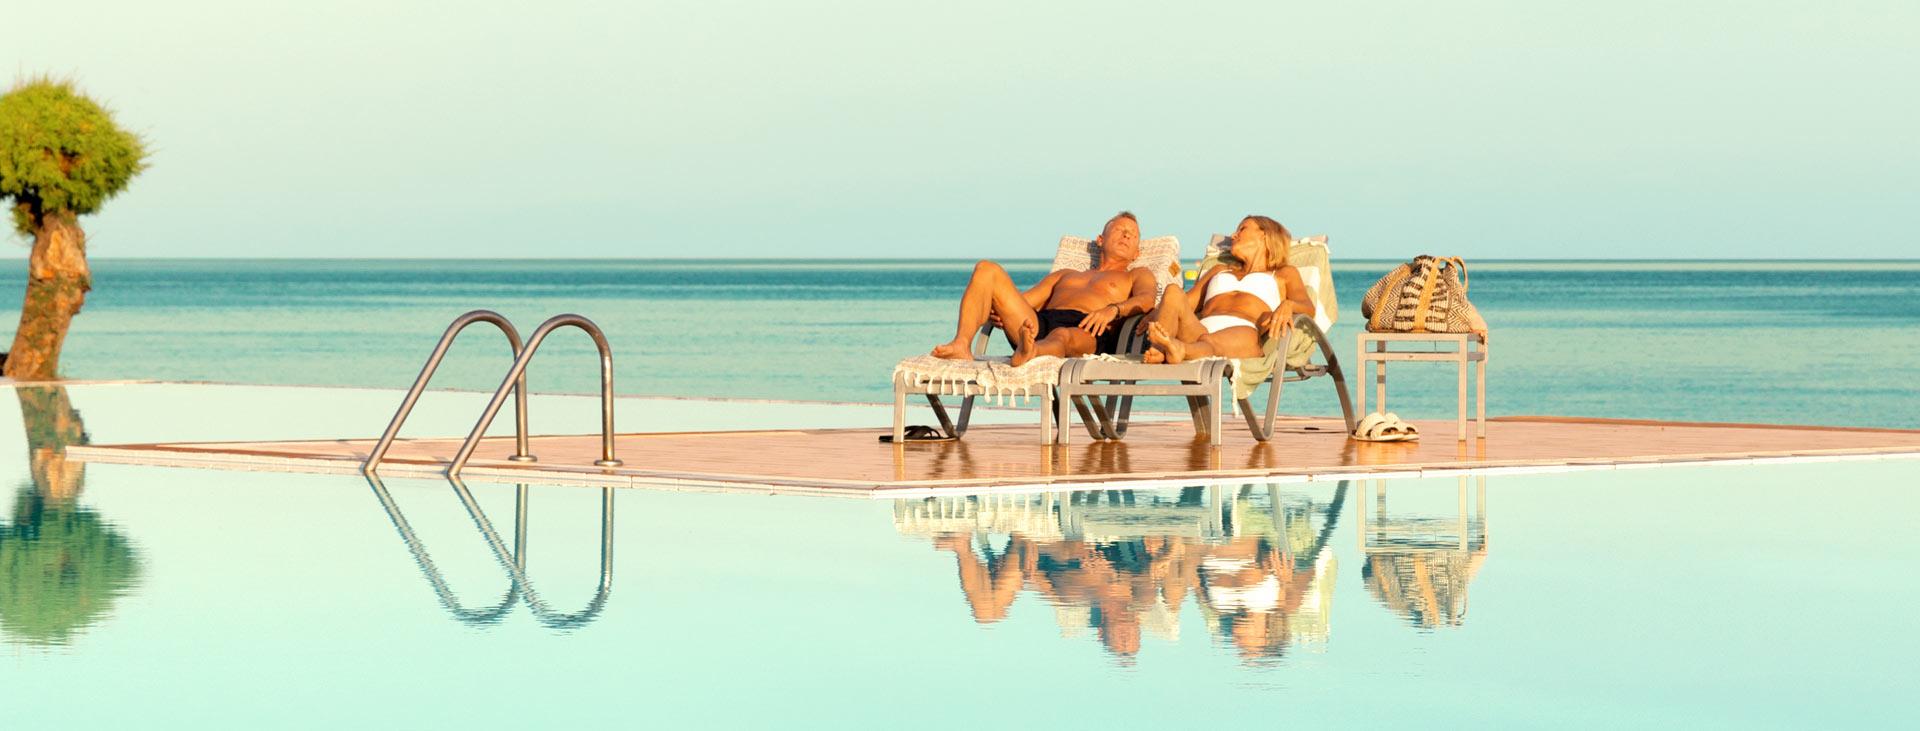 Sunprime Miramare Beach, Rhodos västkust, Rhodos, Grekland